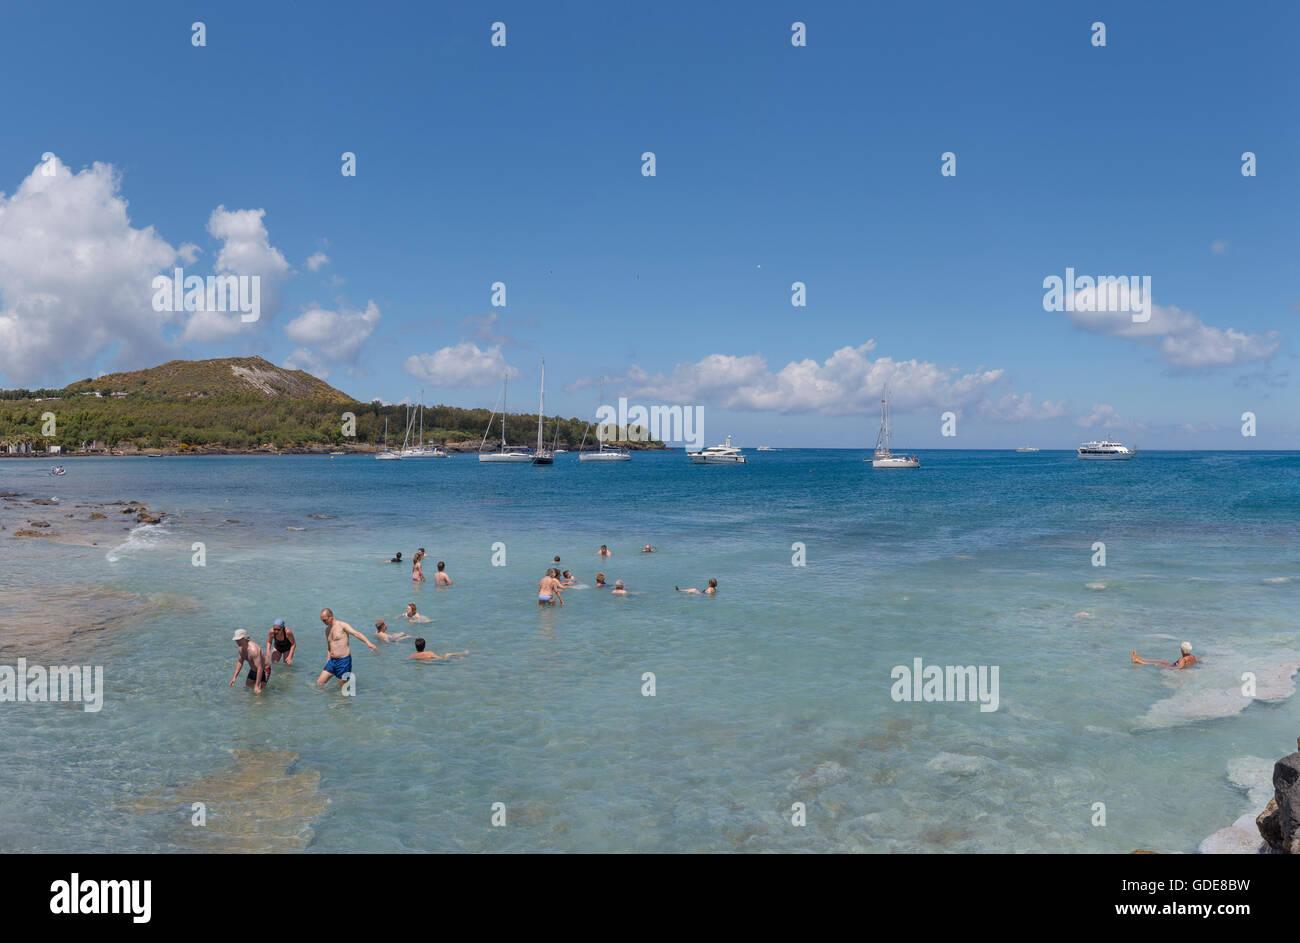 Tyrrhenian Sea - Stock Image